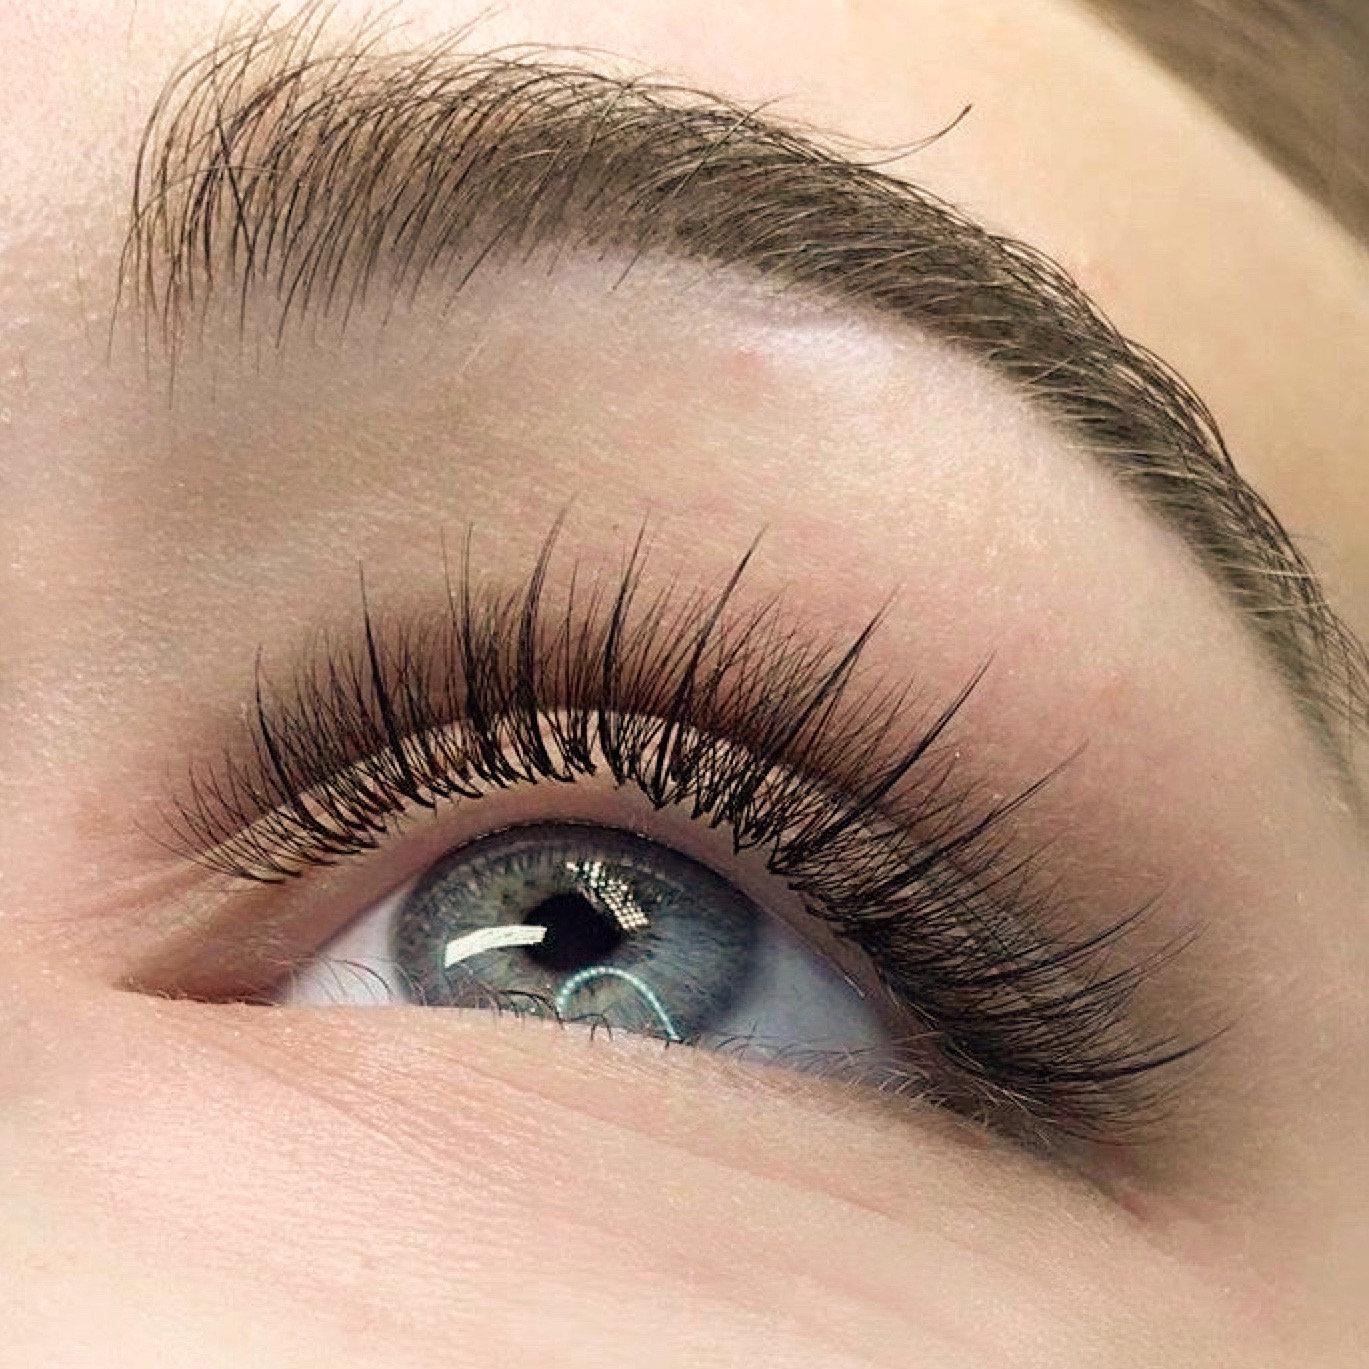 Classic Eyelash Extensions - Full Set